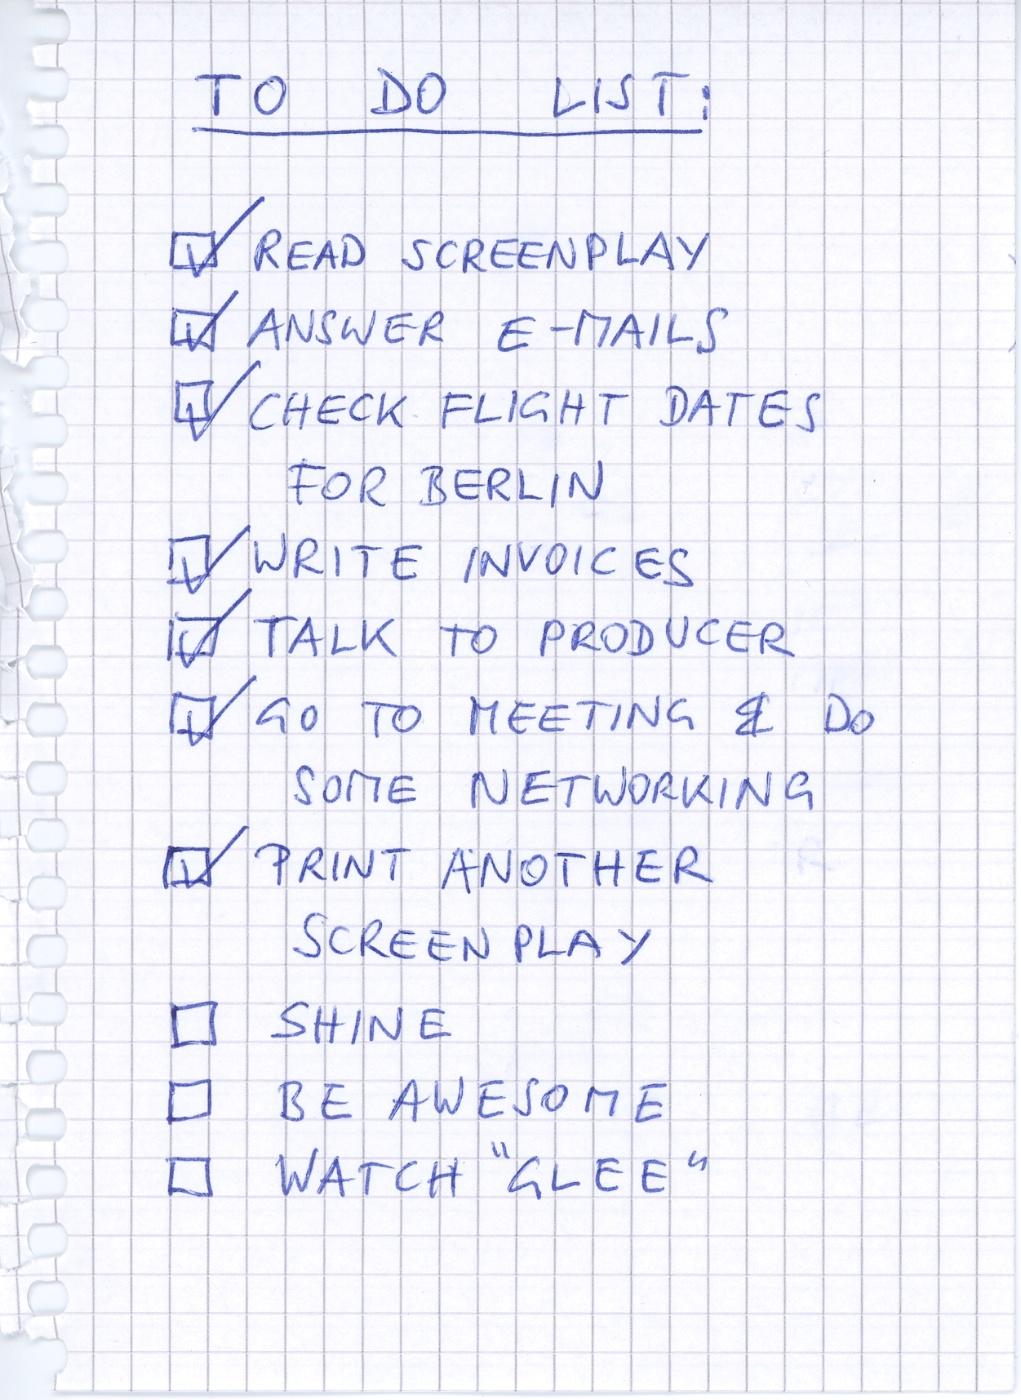 Be Creative #38 - To Do List, © Ines Häufler, 2011